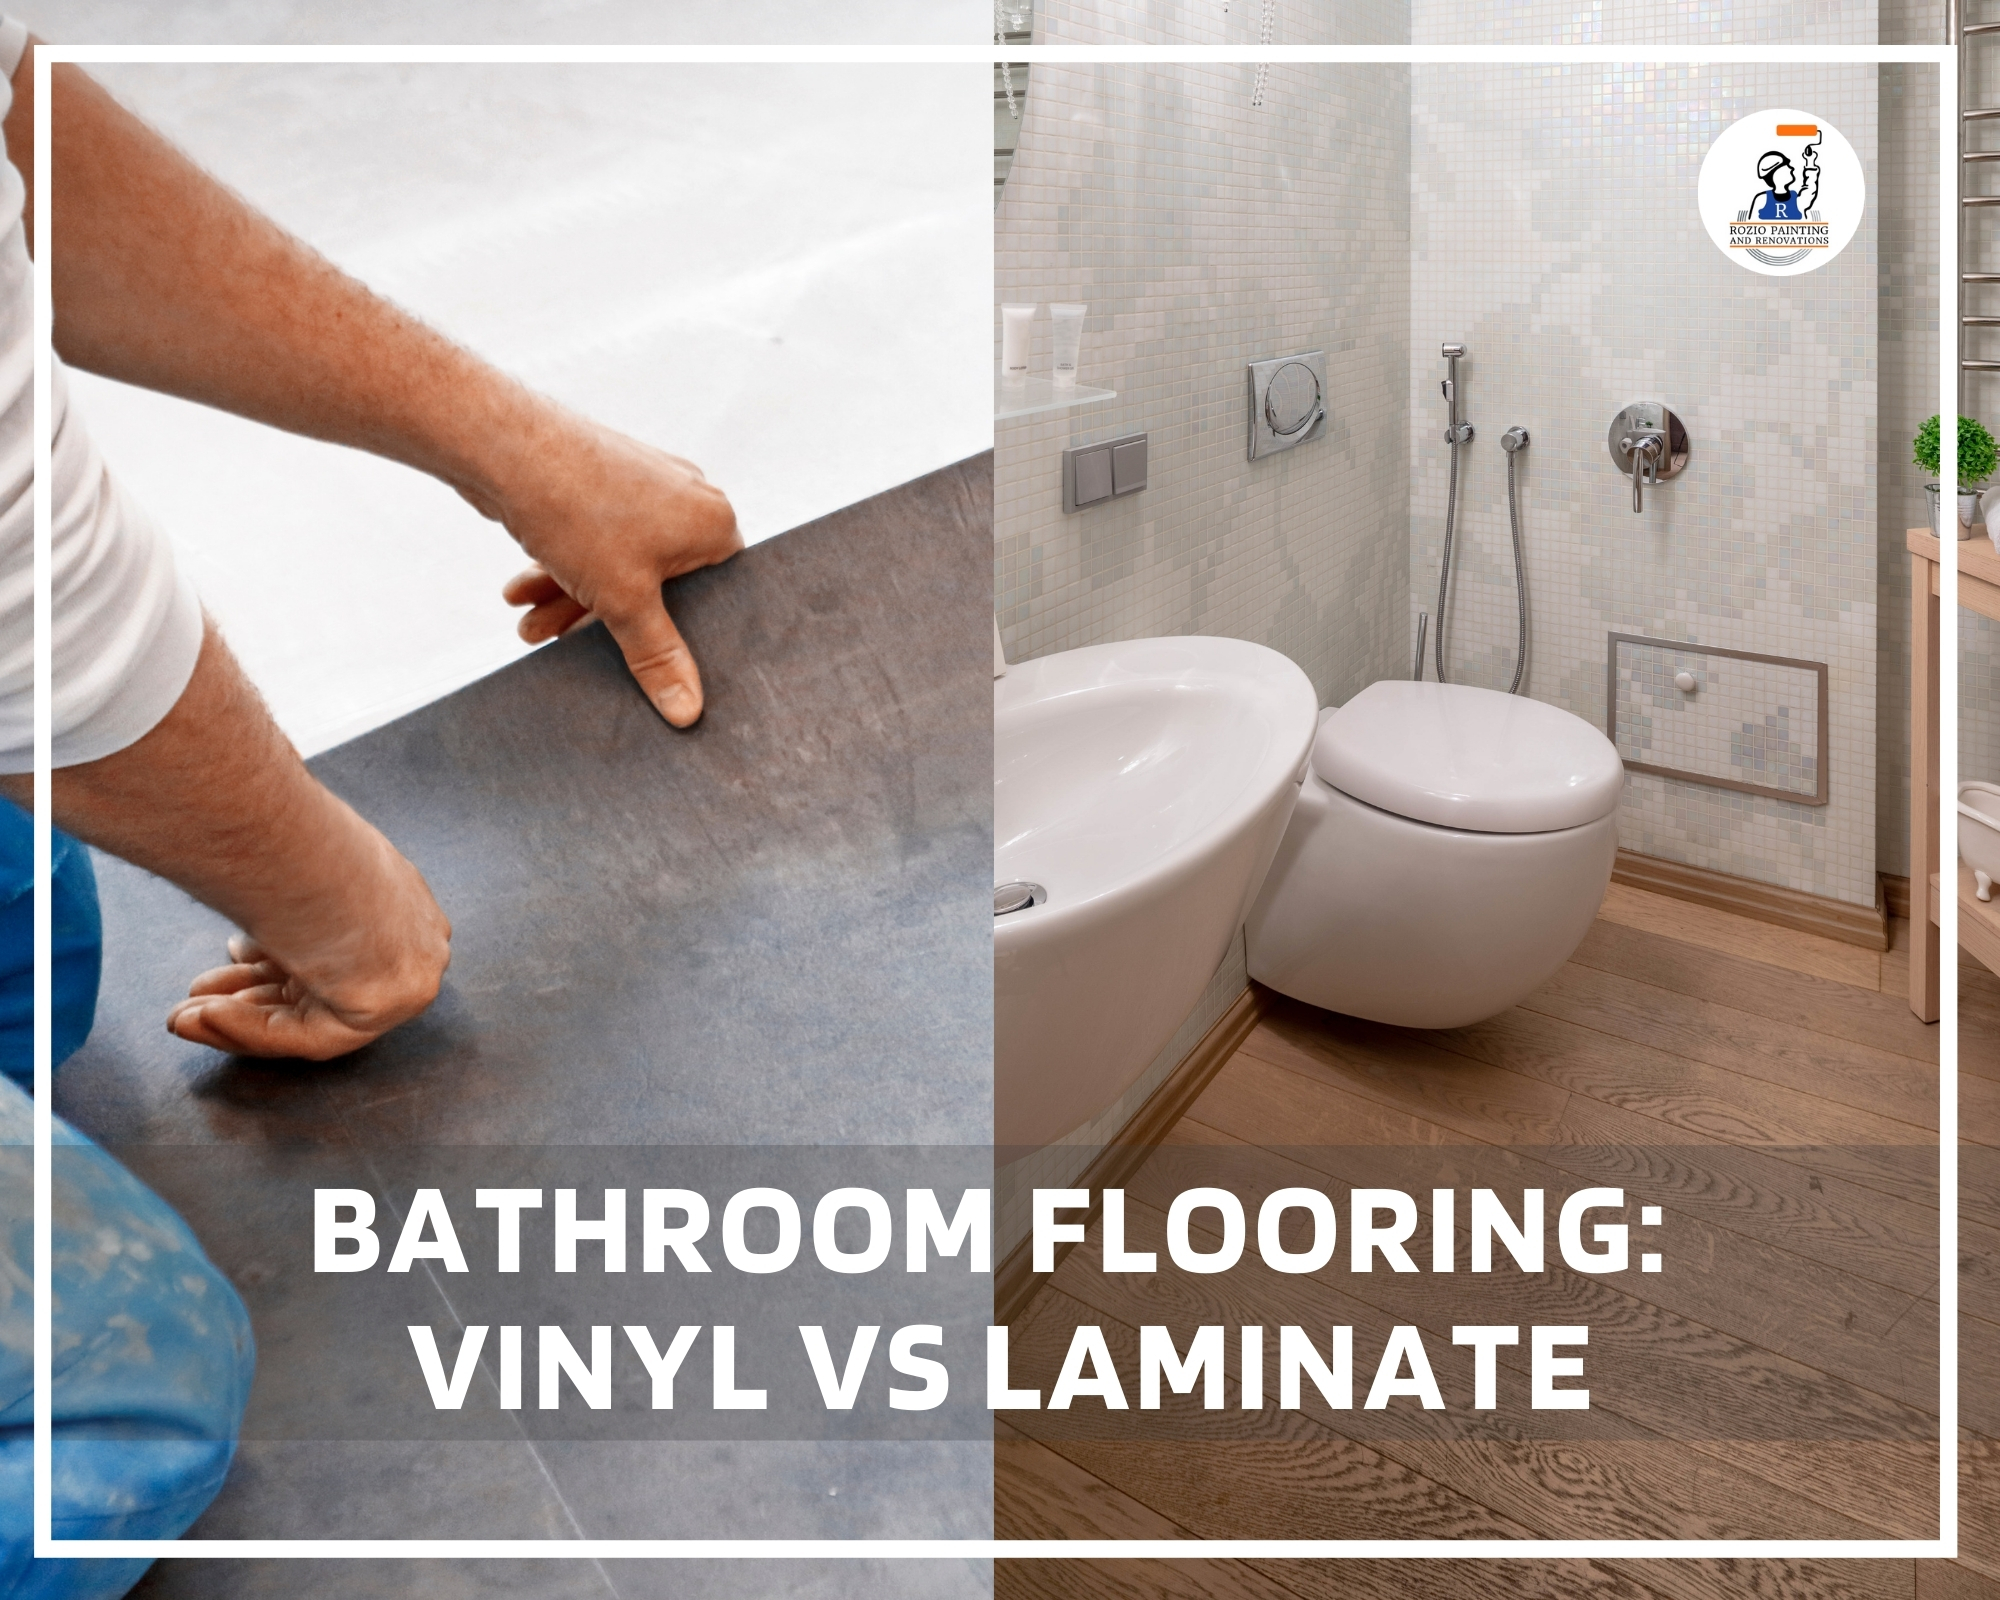 Bathroom flooring: Vinyl Vs Laminate